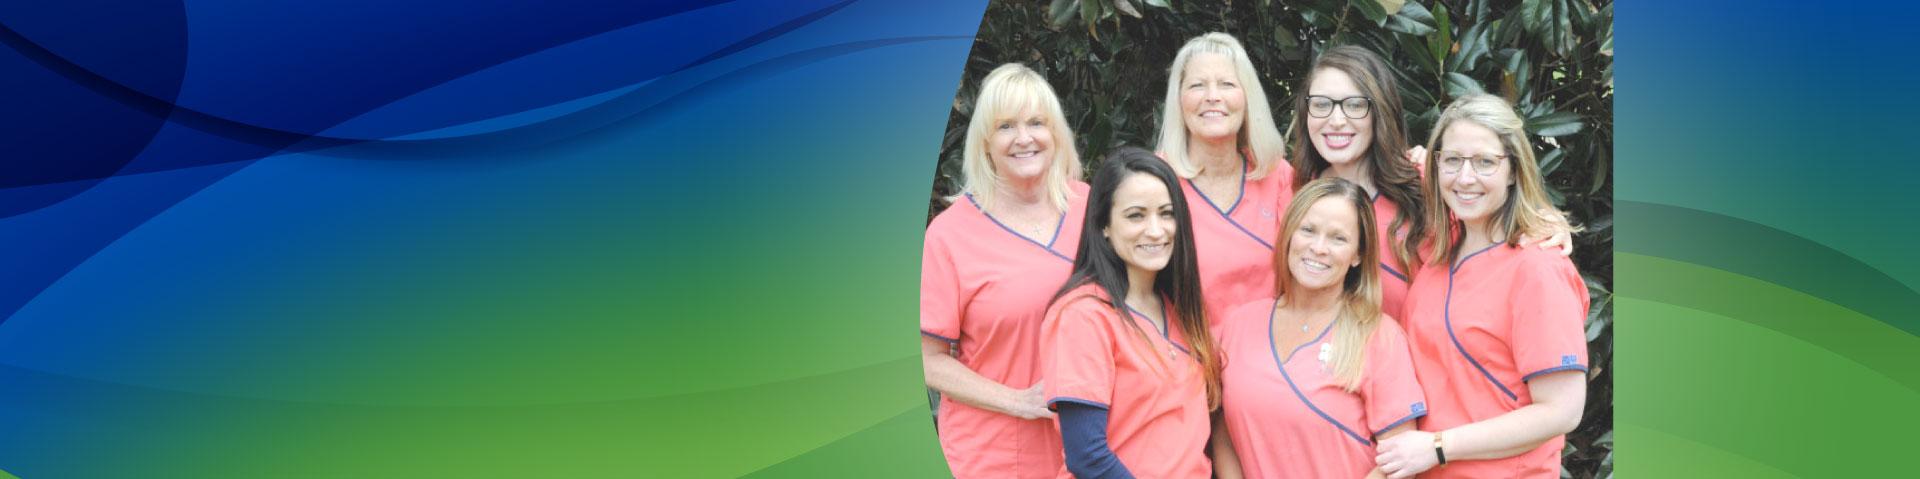 dental cleaning team